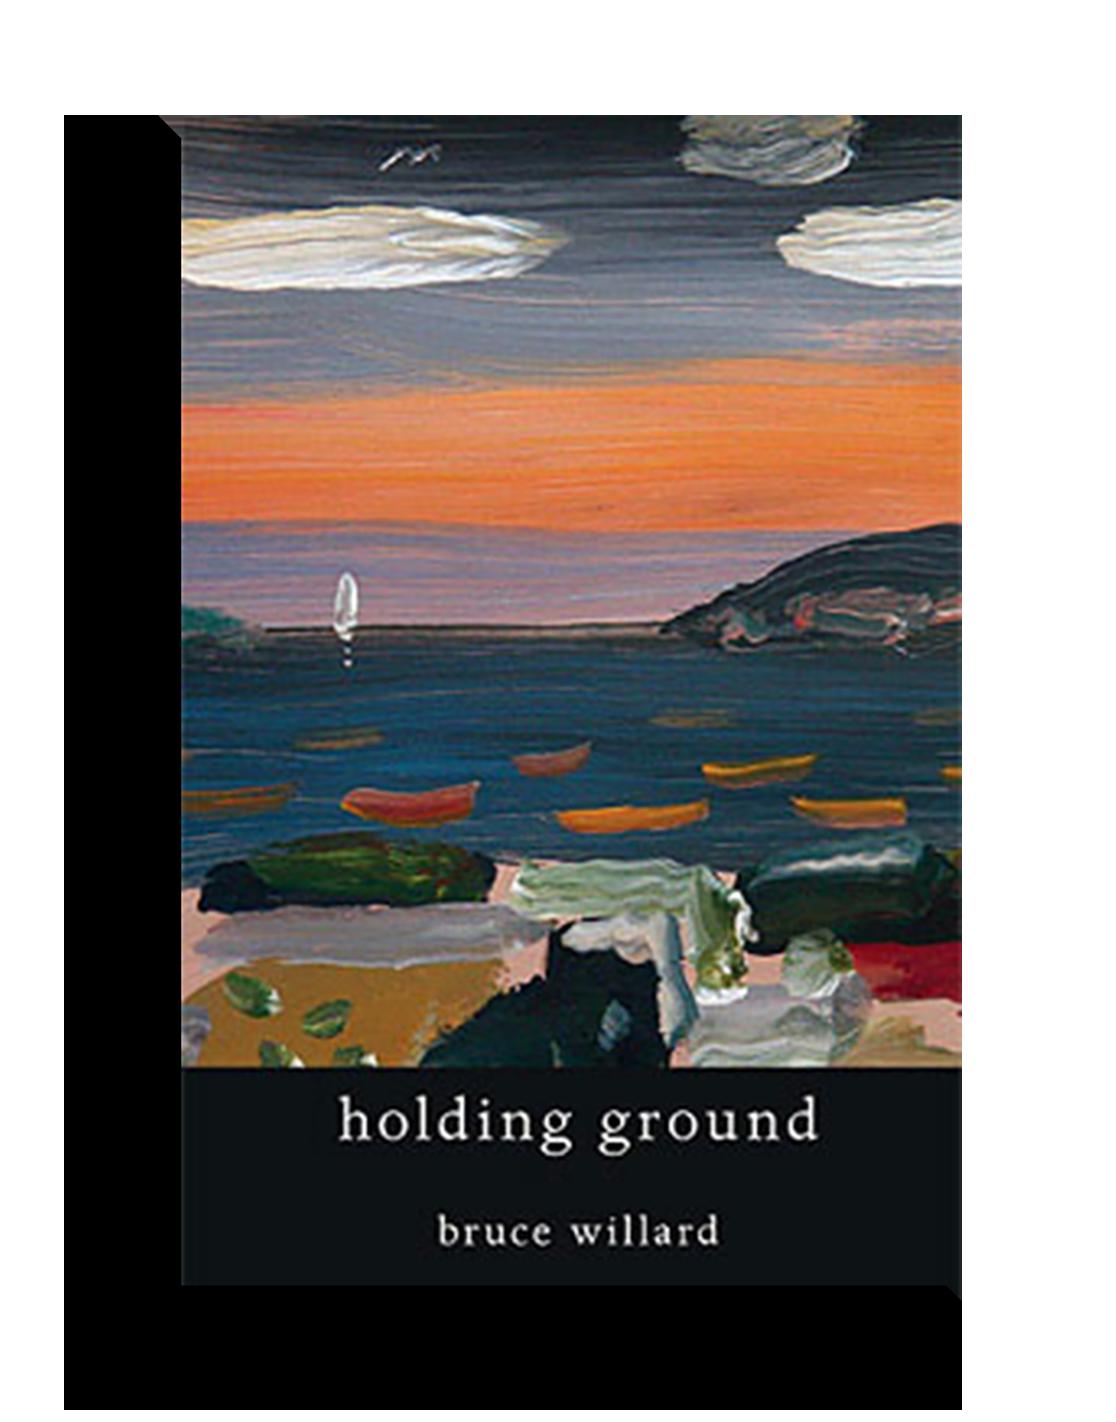 holding_ground_cover_white_bg_2013.png